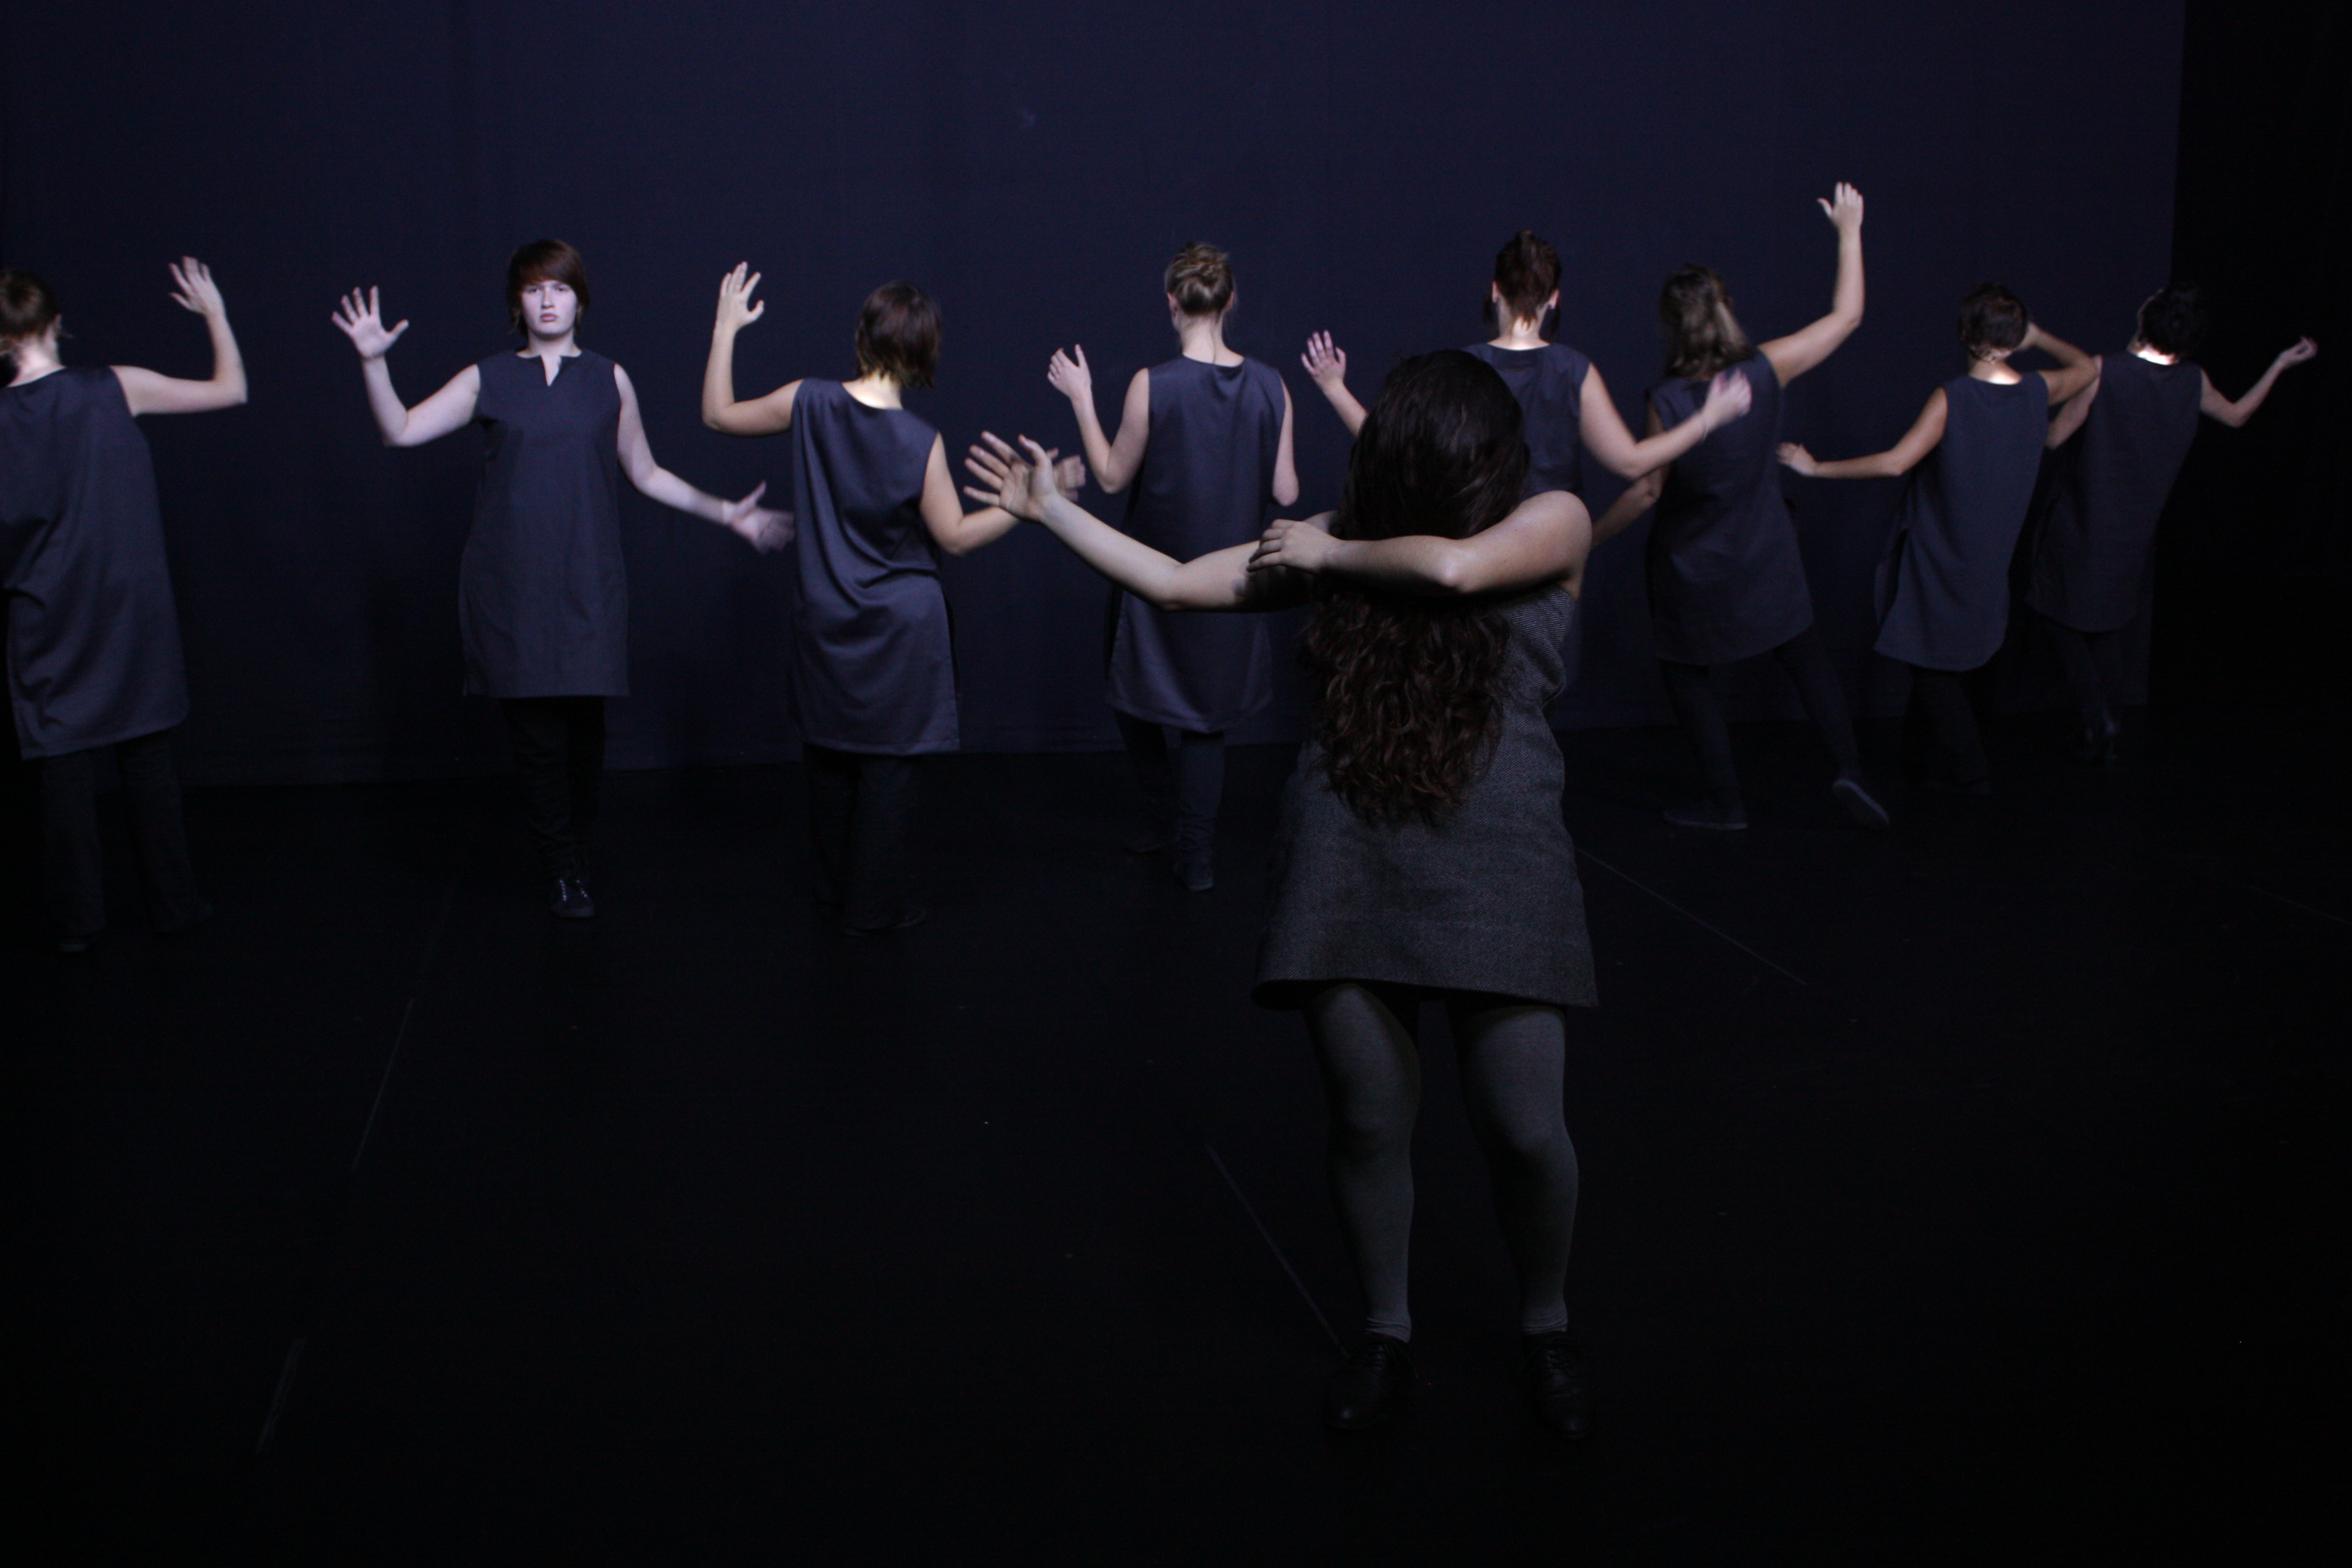 http://www.danzaurbana.eu/associazione/wp-content/uploads/2017/06/CREDITS-Demetrio-Castellucci_DeweyDell.jpg